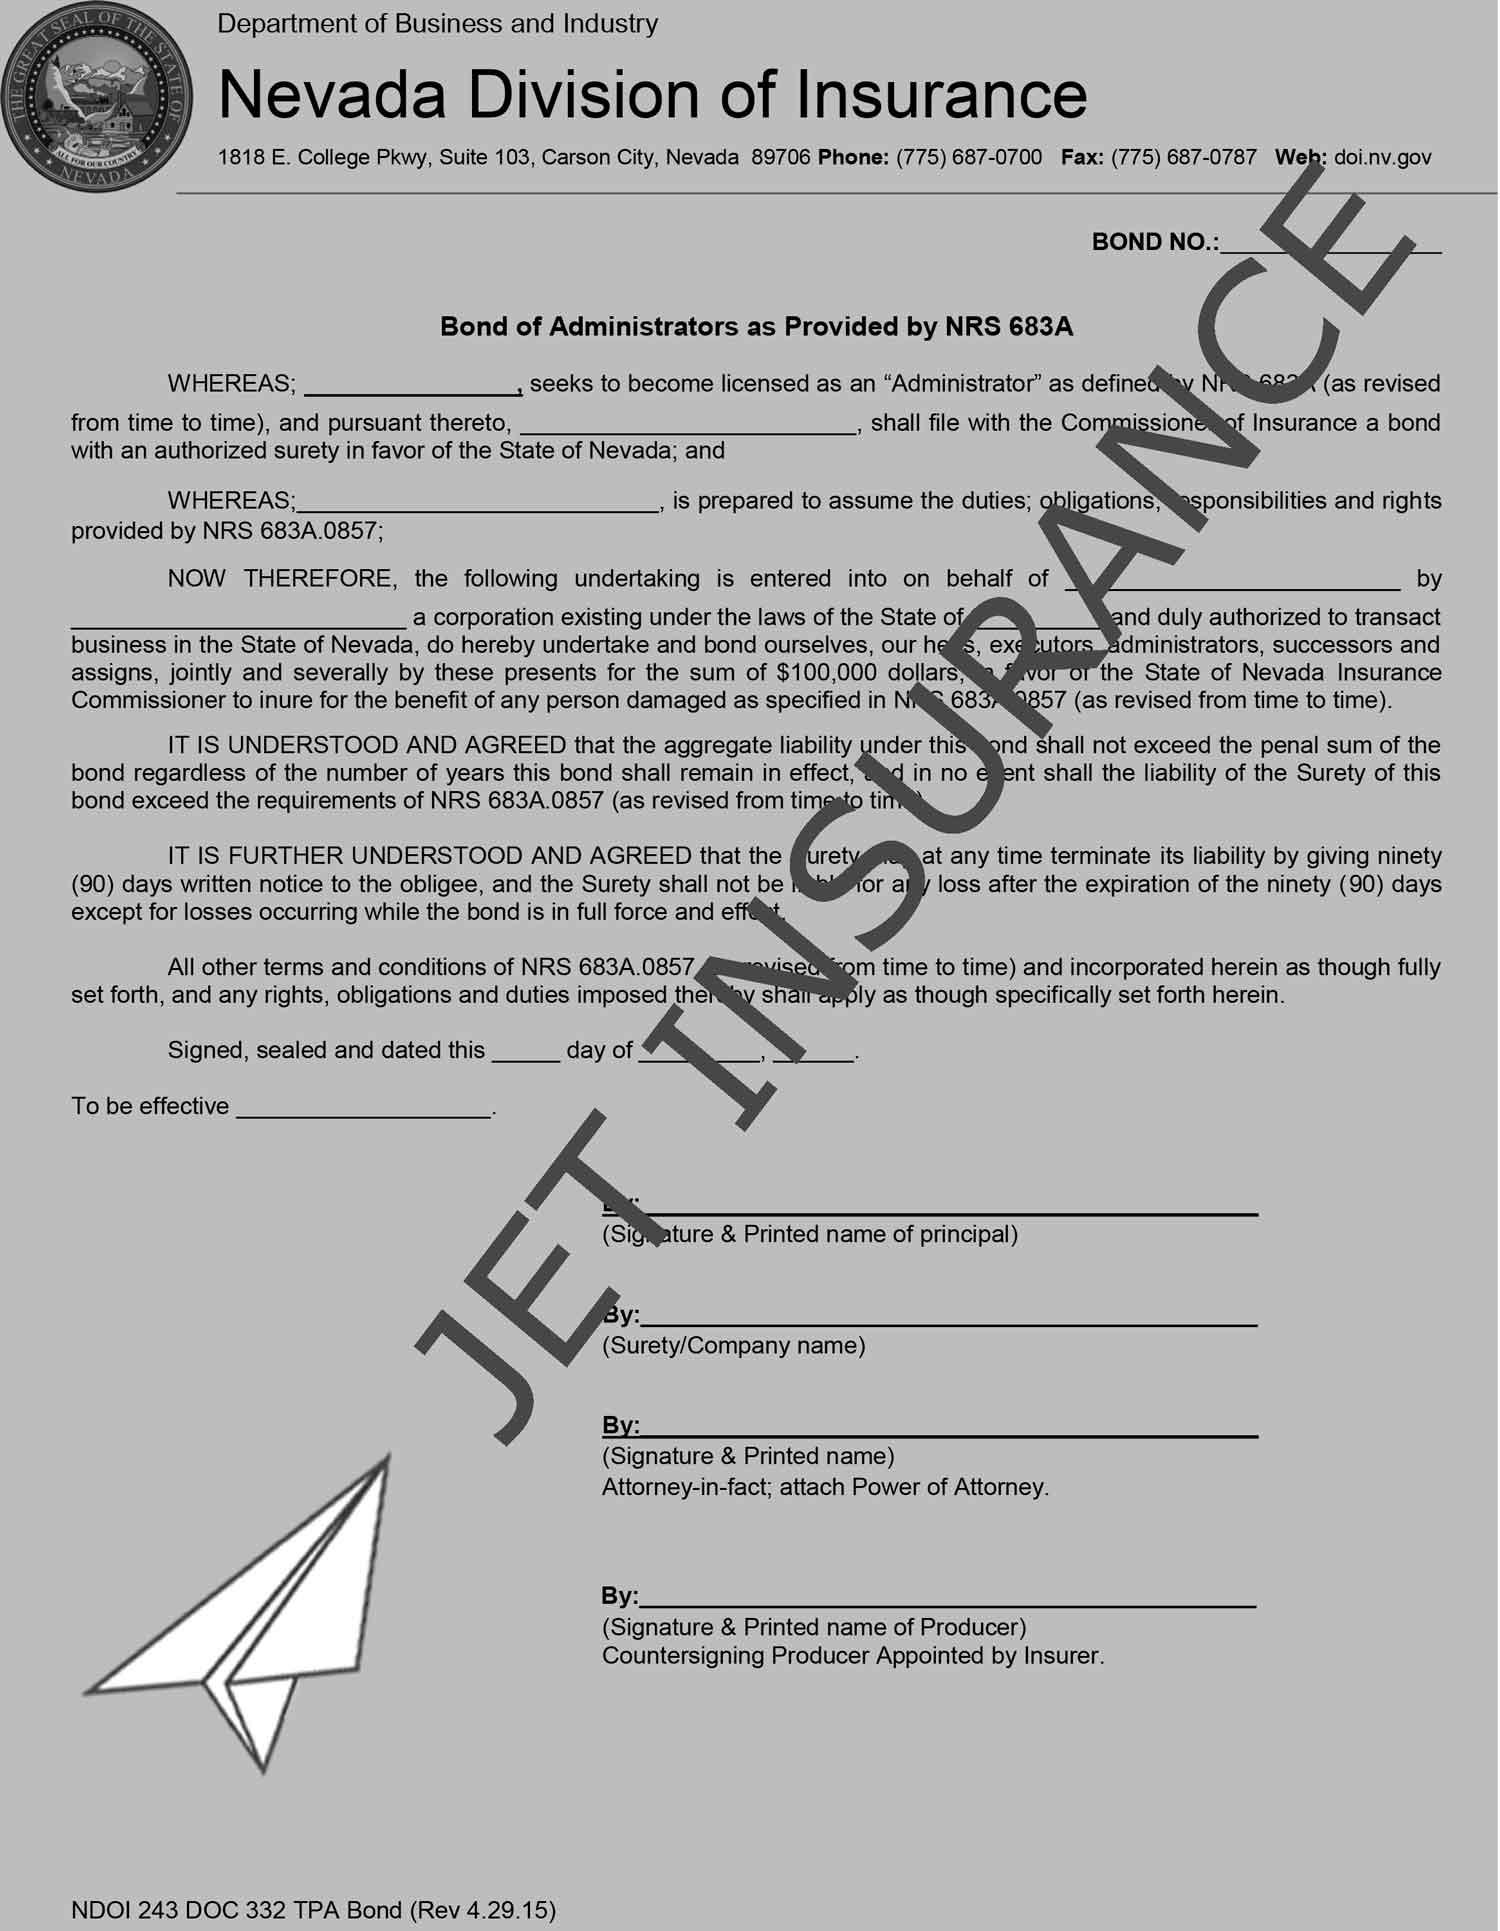 Nevada Third-Party Administrator Bond Form